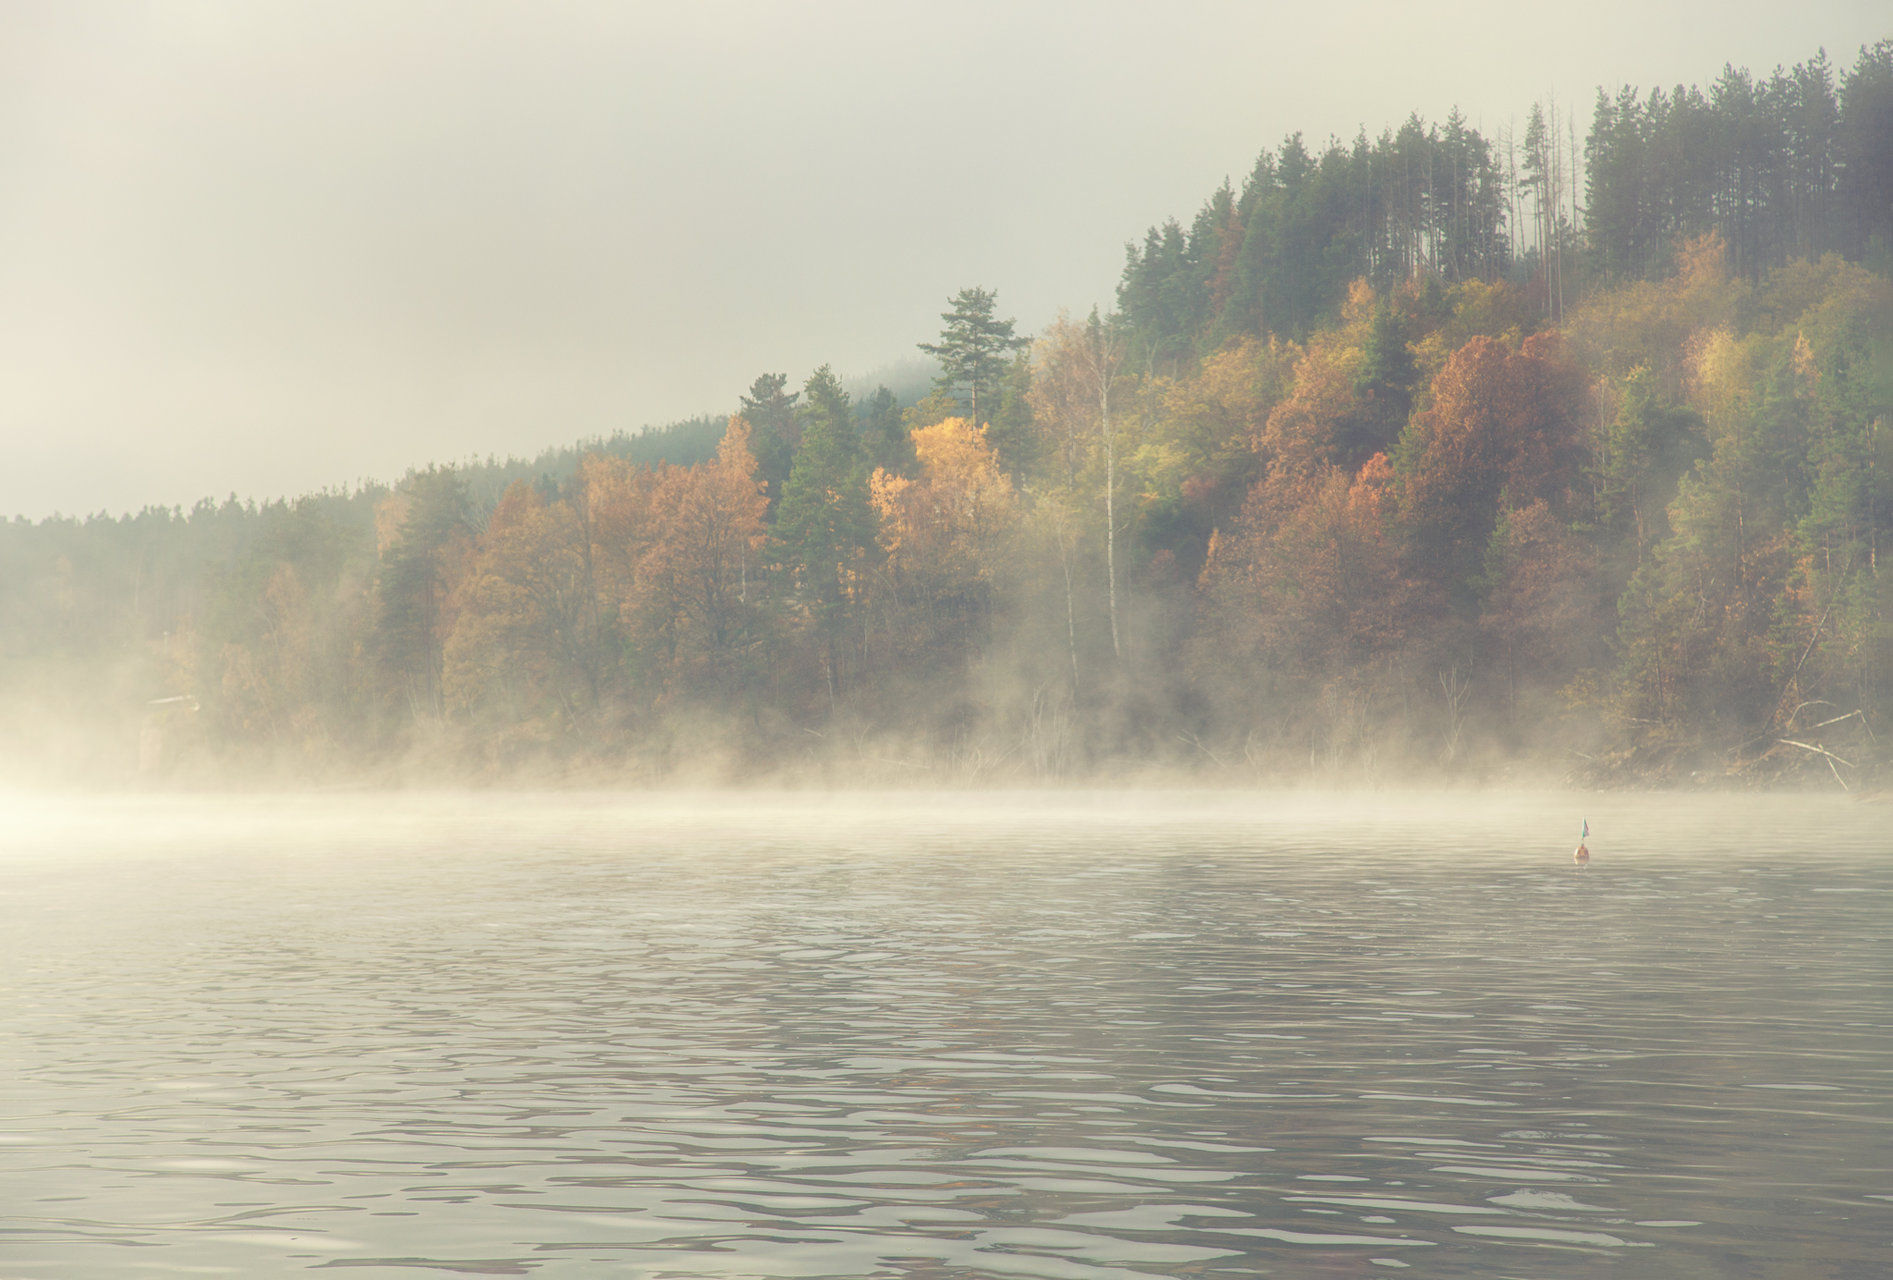 Photo in Landscape | Author Teddy_Boeva | PHOTO FORUM